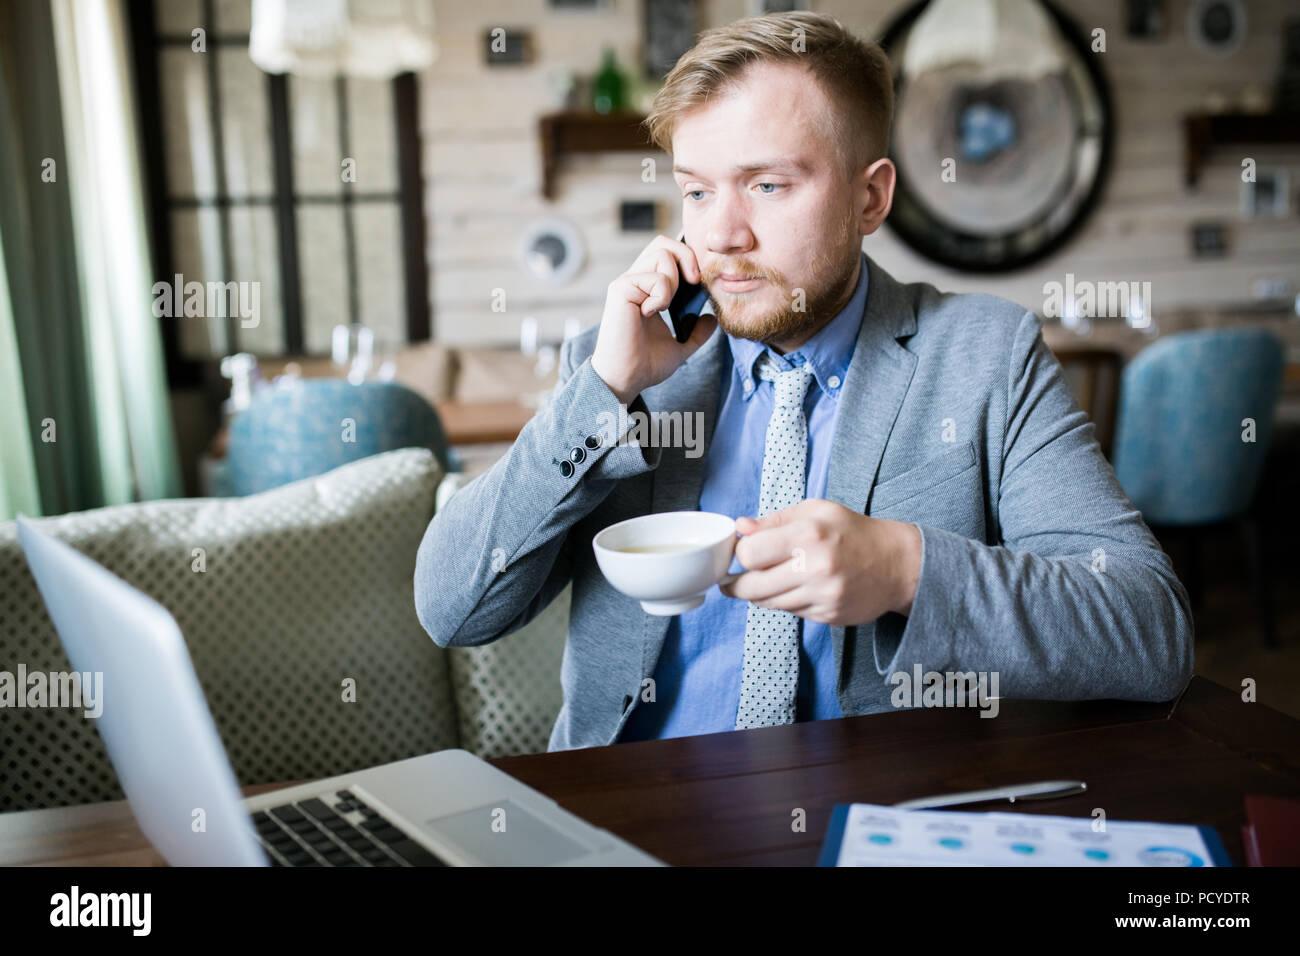 Freelancer working at cafe - Stock Image